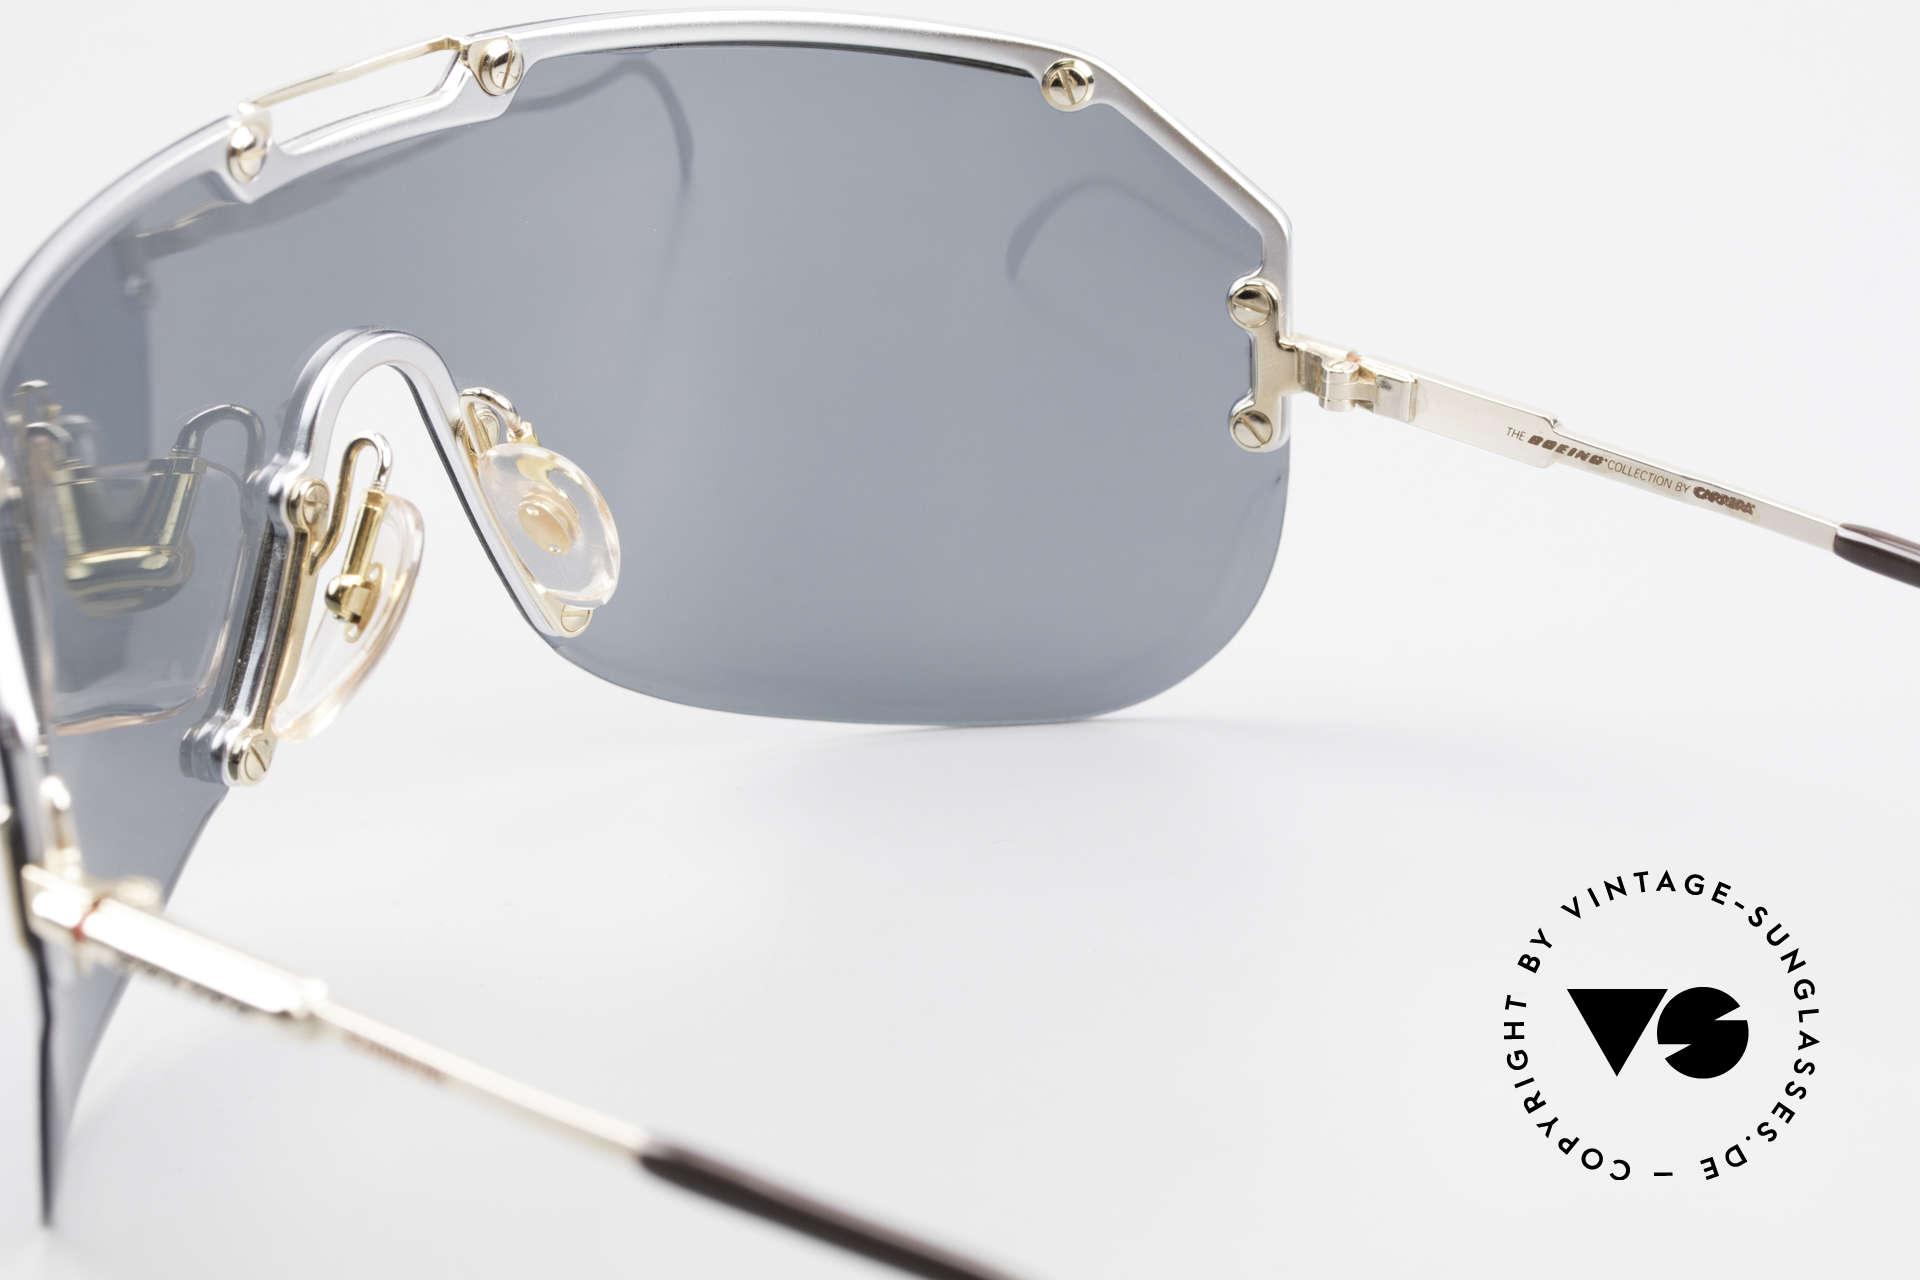 Boeing 5703 80's Luxury Pilots Sunglasses, Size: medium, Made for Men